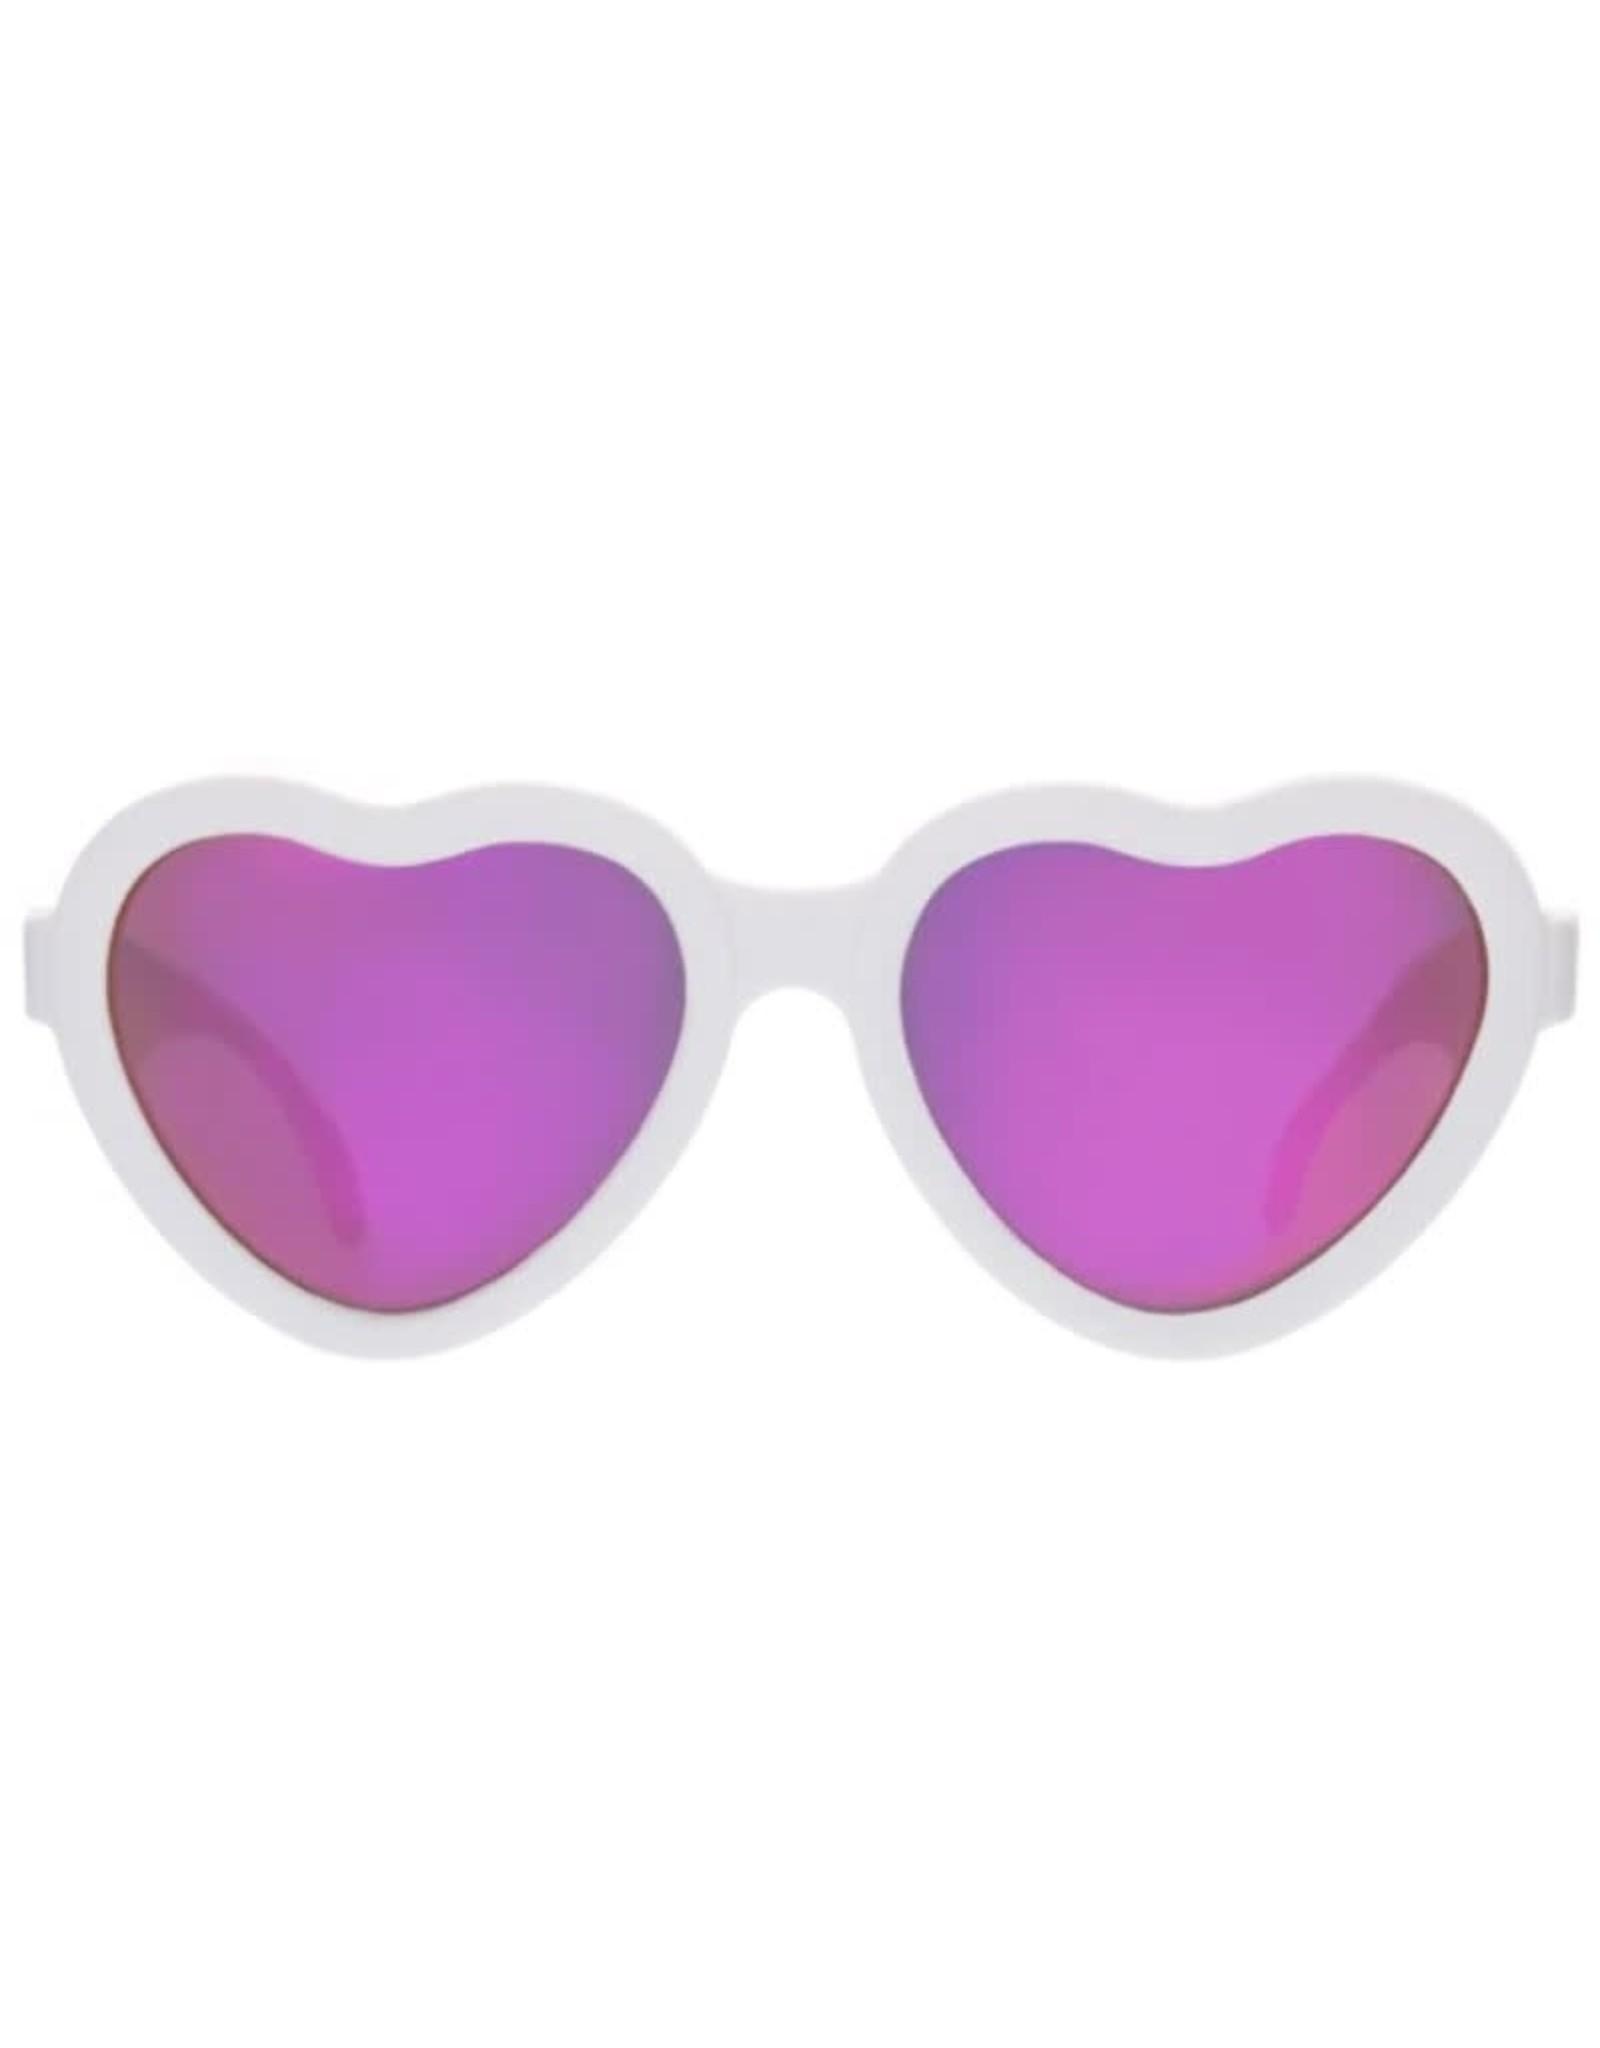 "Babiators ""The Sweetheart"" Sunglasses"